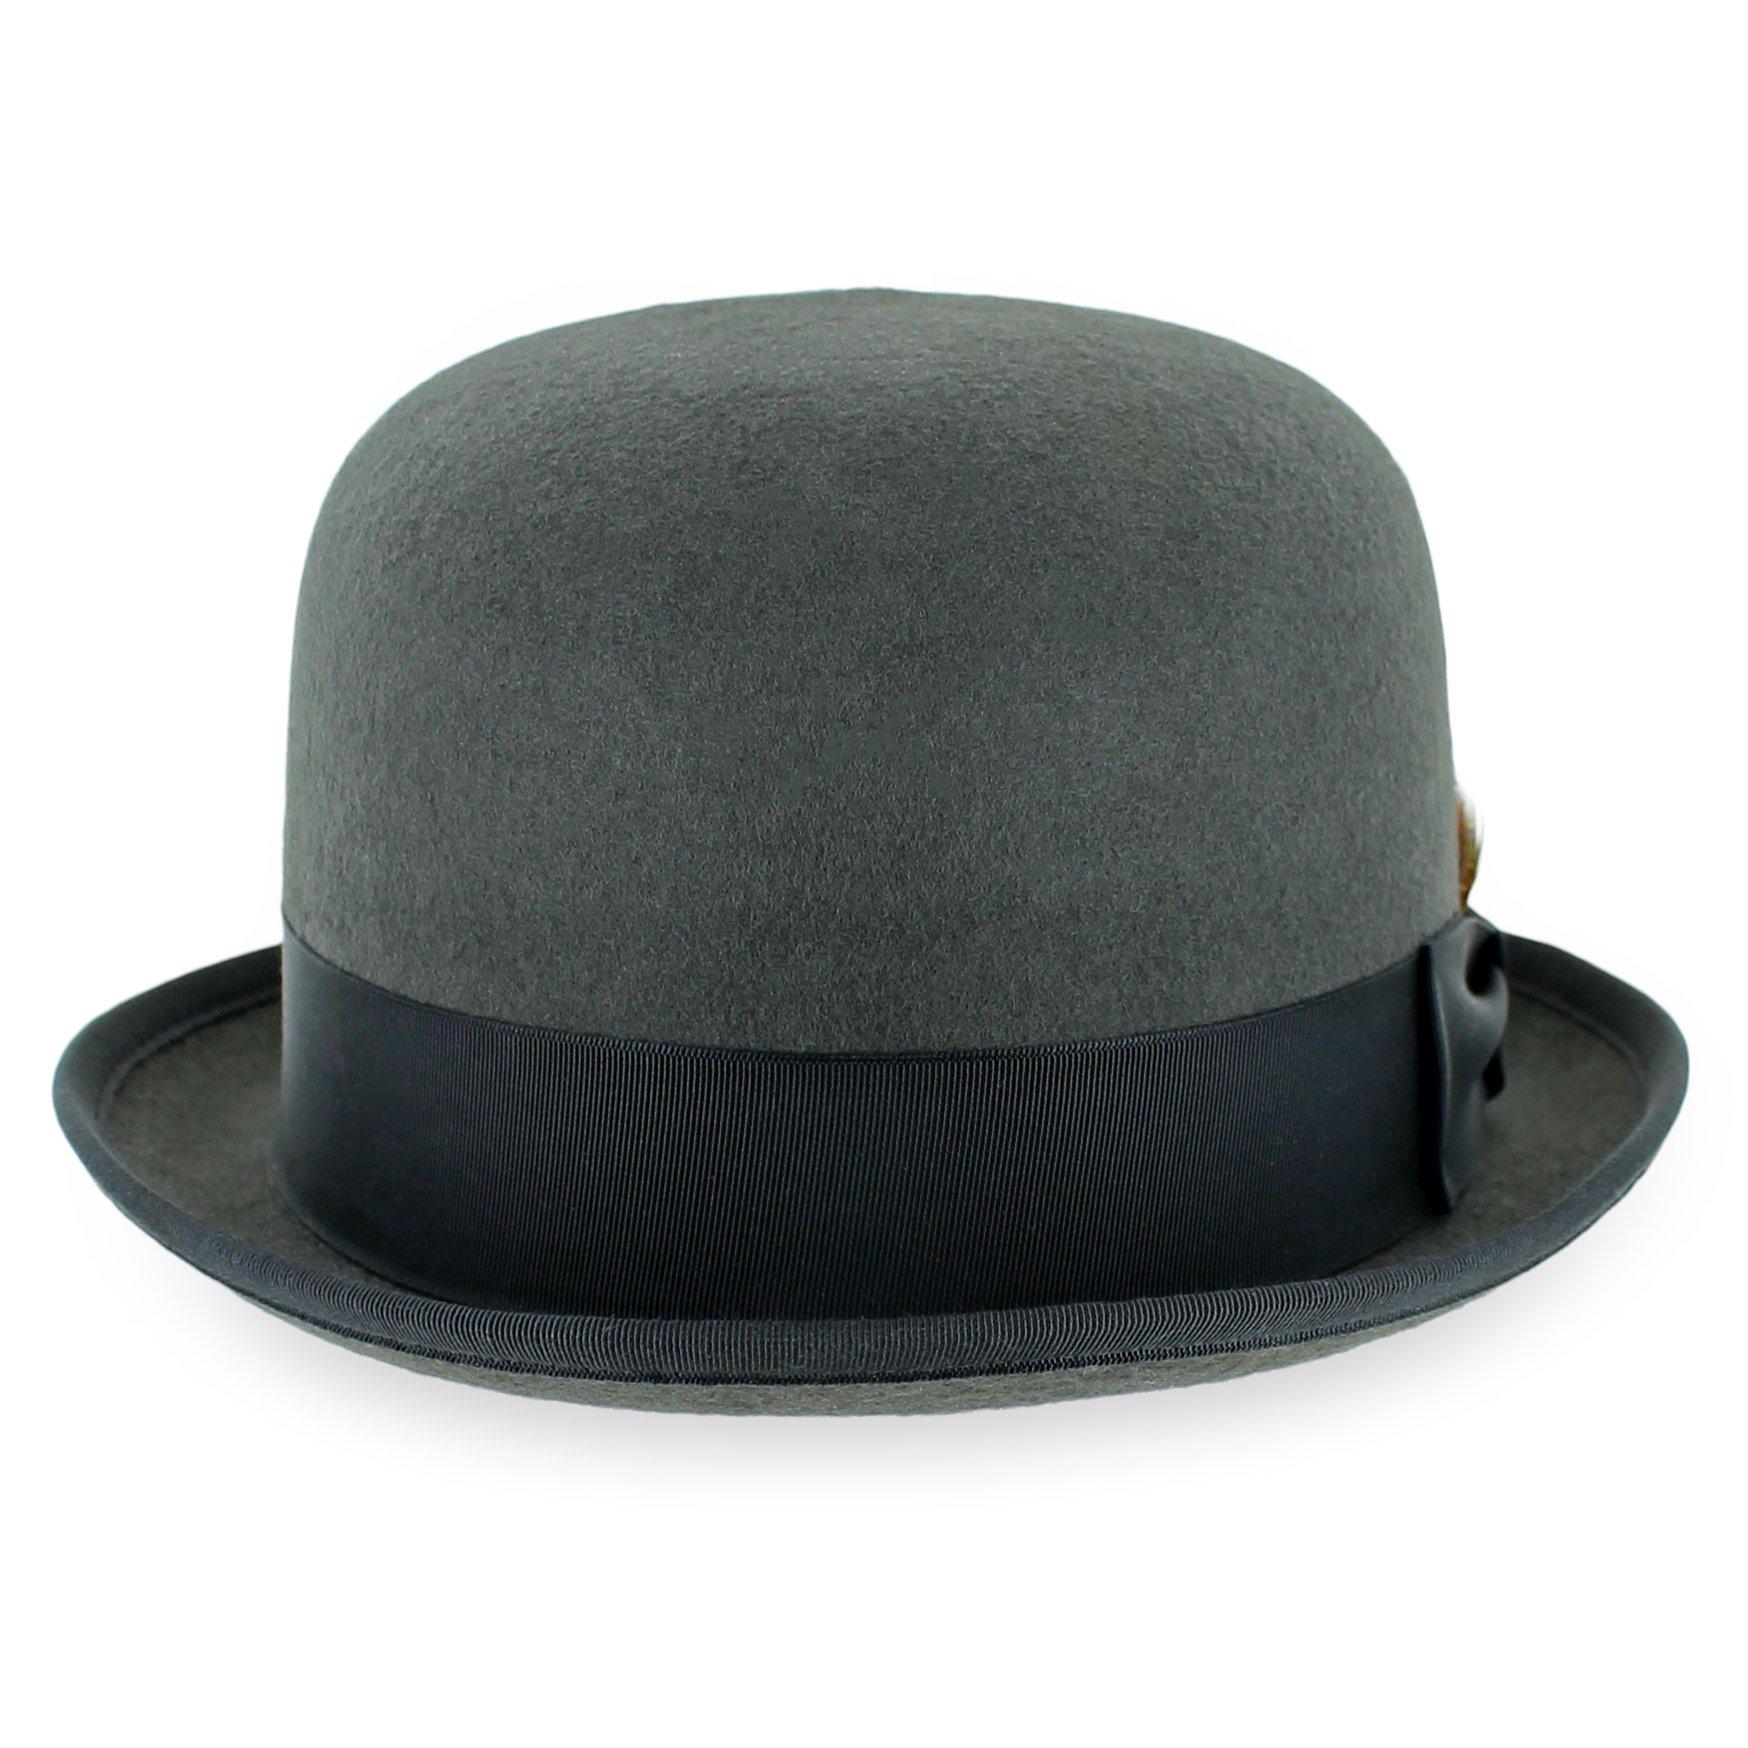 Belfry Deuce 100% Wool Felt Stingy Brim Men's Derby Bowler Hat in 4 Sizes and 2 Colors (XL, Grey)